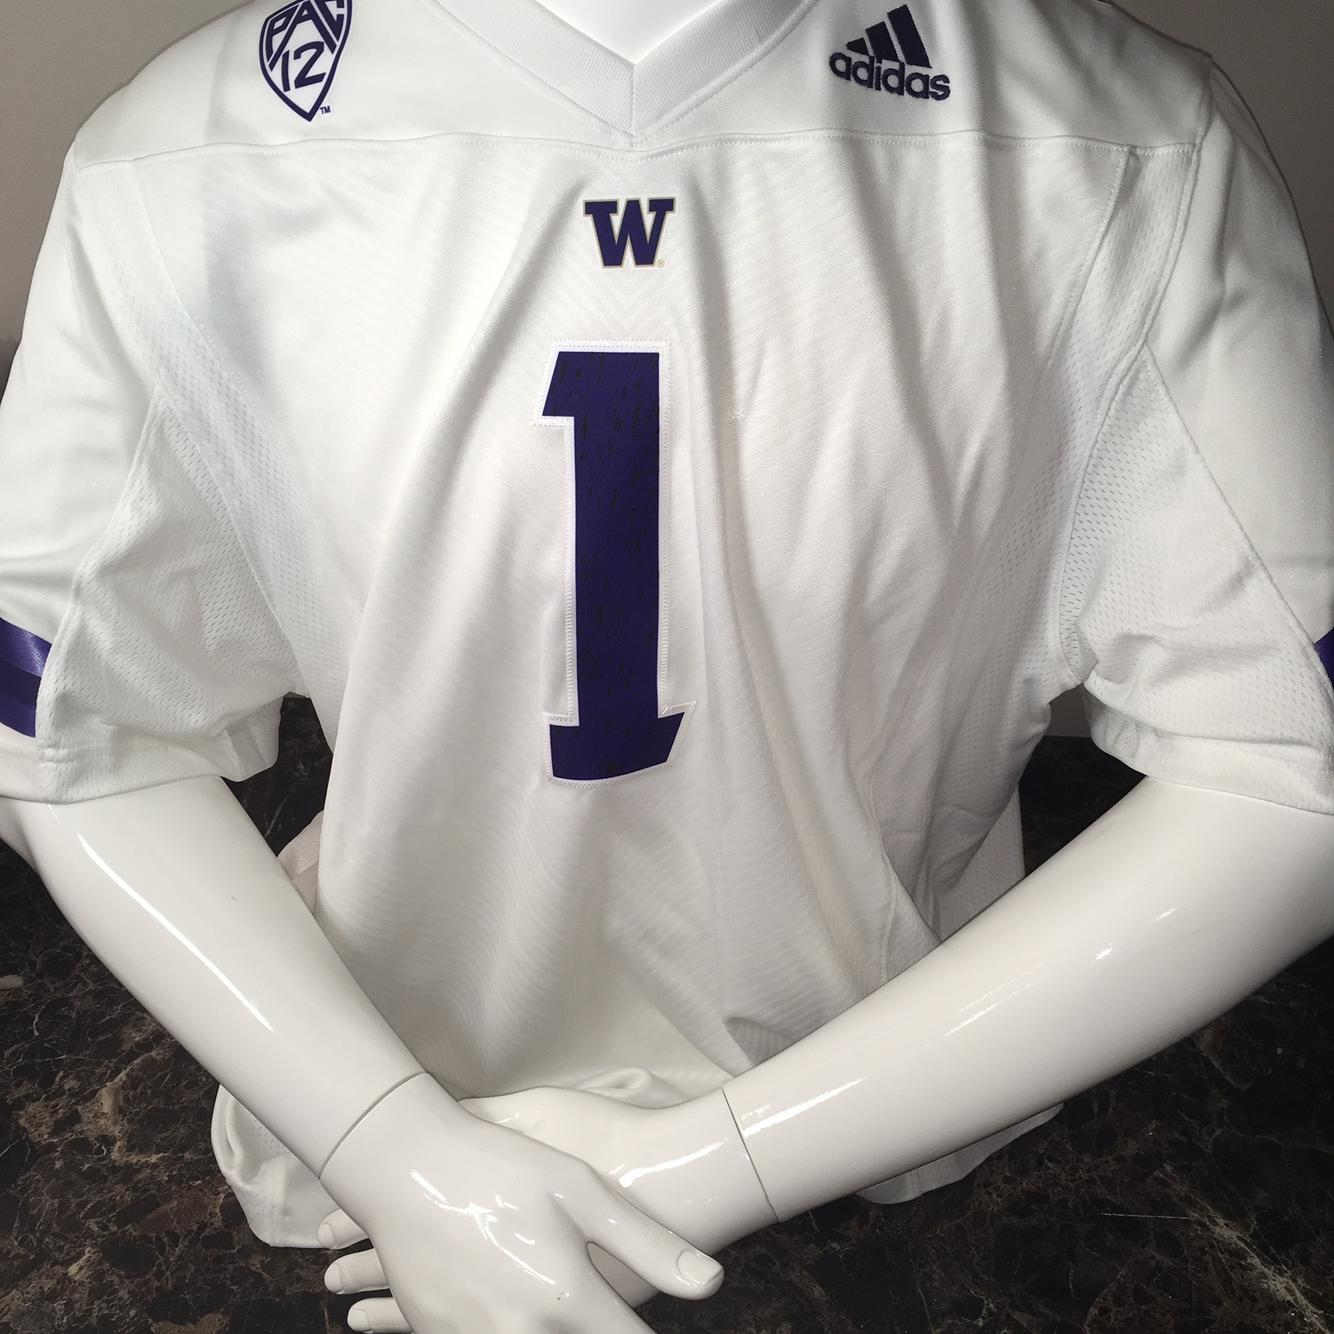 University of Washington UW Huskies Adidas Football Jersey #1 ...